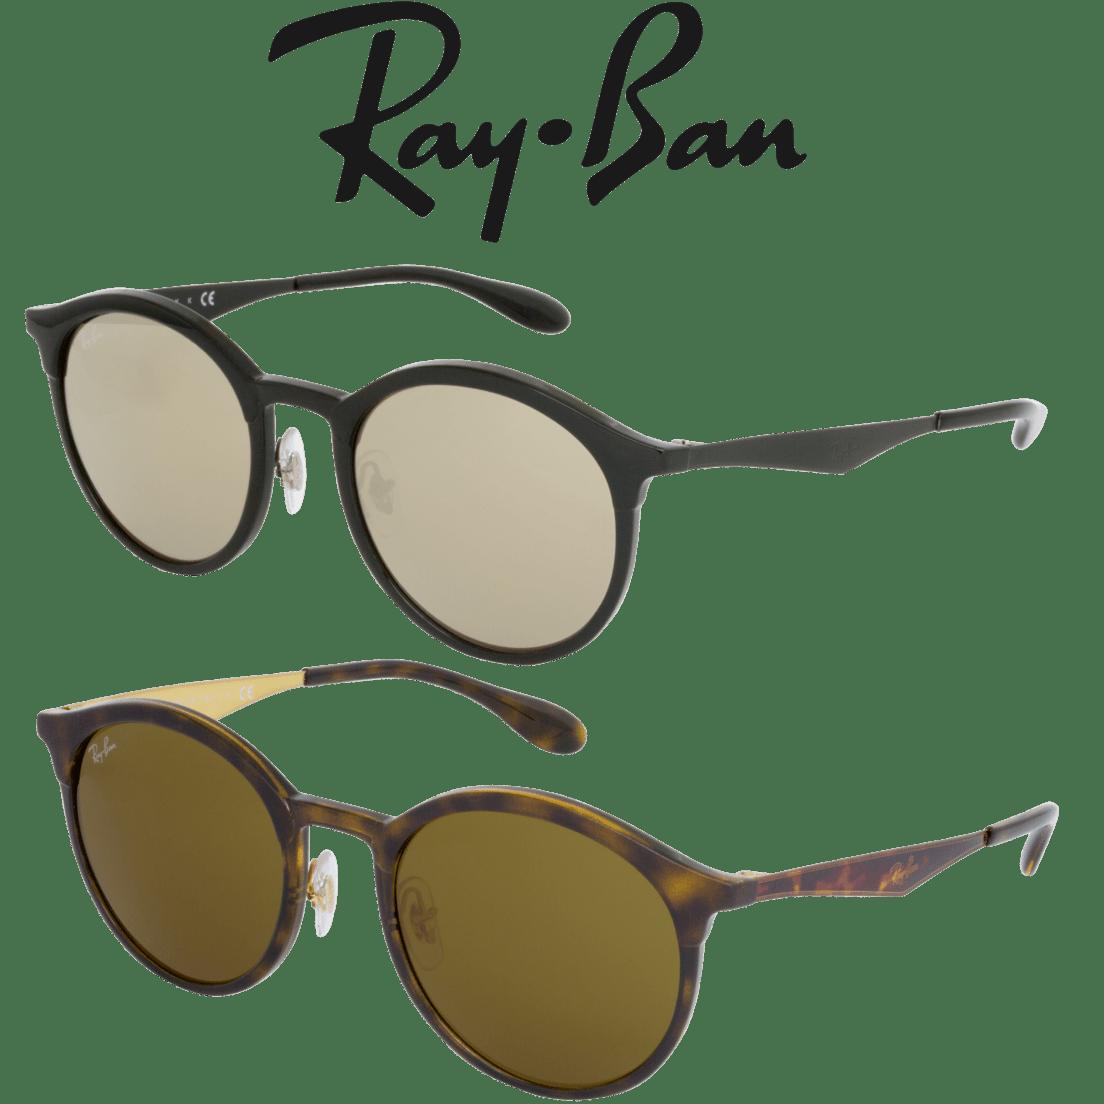 2ebeb419ca Ray Ban Emma RB4277 Sunglasses